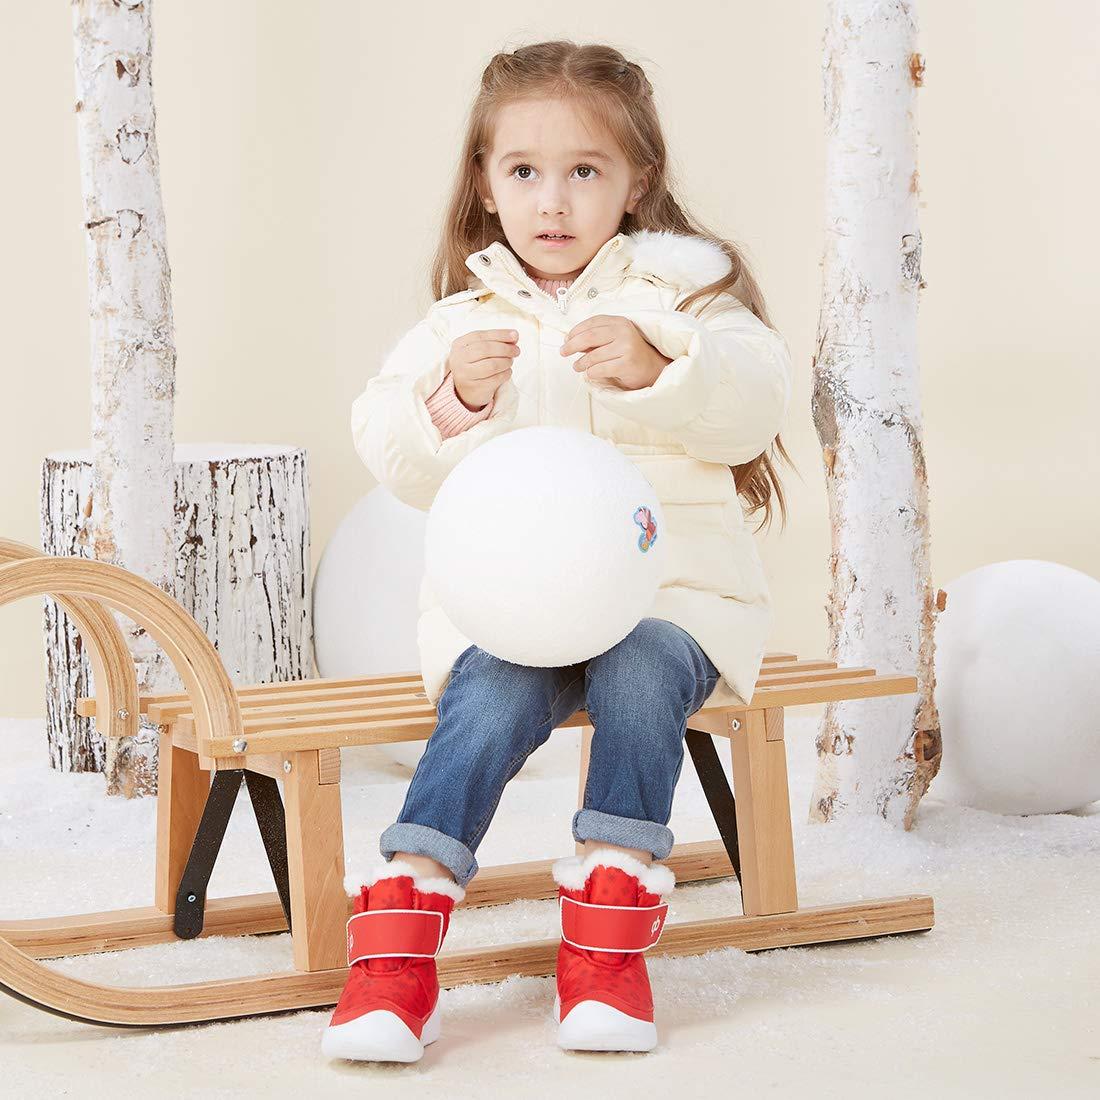 BMCiTYBM Toddler Winter Snow Boots Kids Boys Girls Baby Outdoor Warm Faux Fur